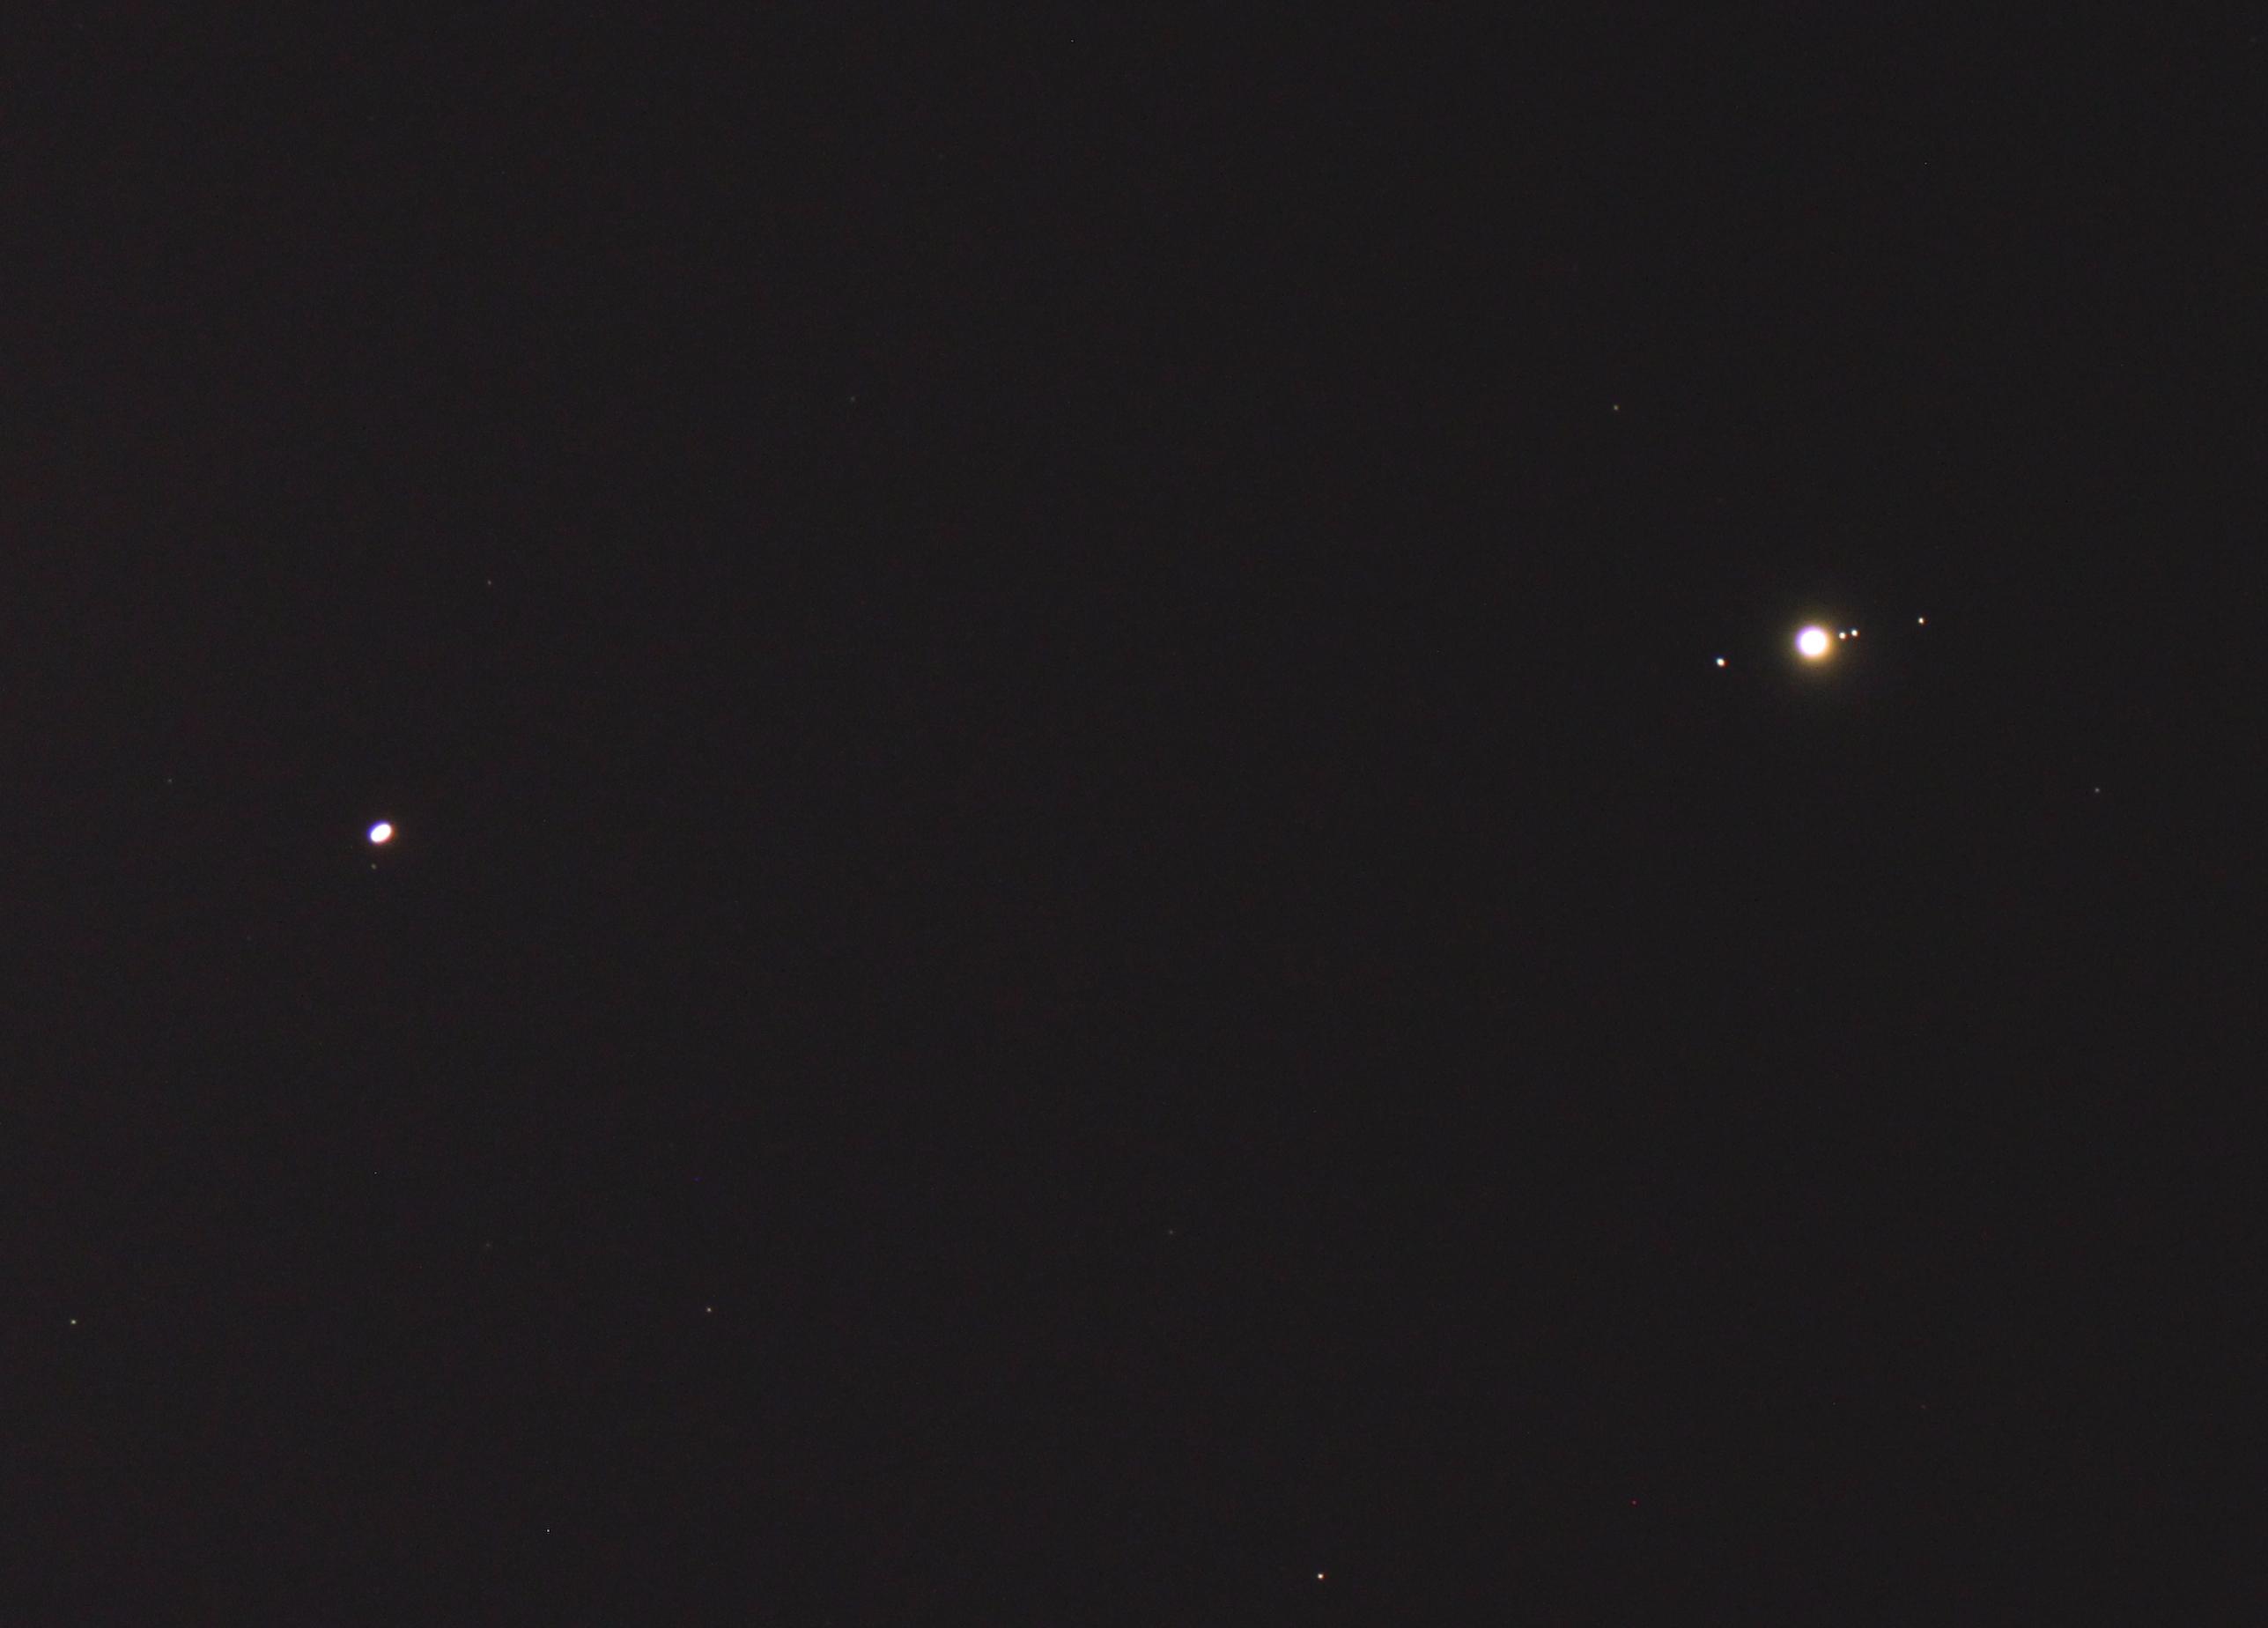 conj-jupiter-saturne-13-12-2020-L80.jpg